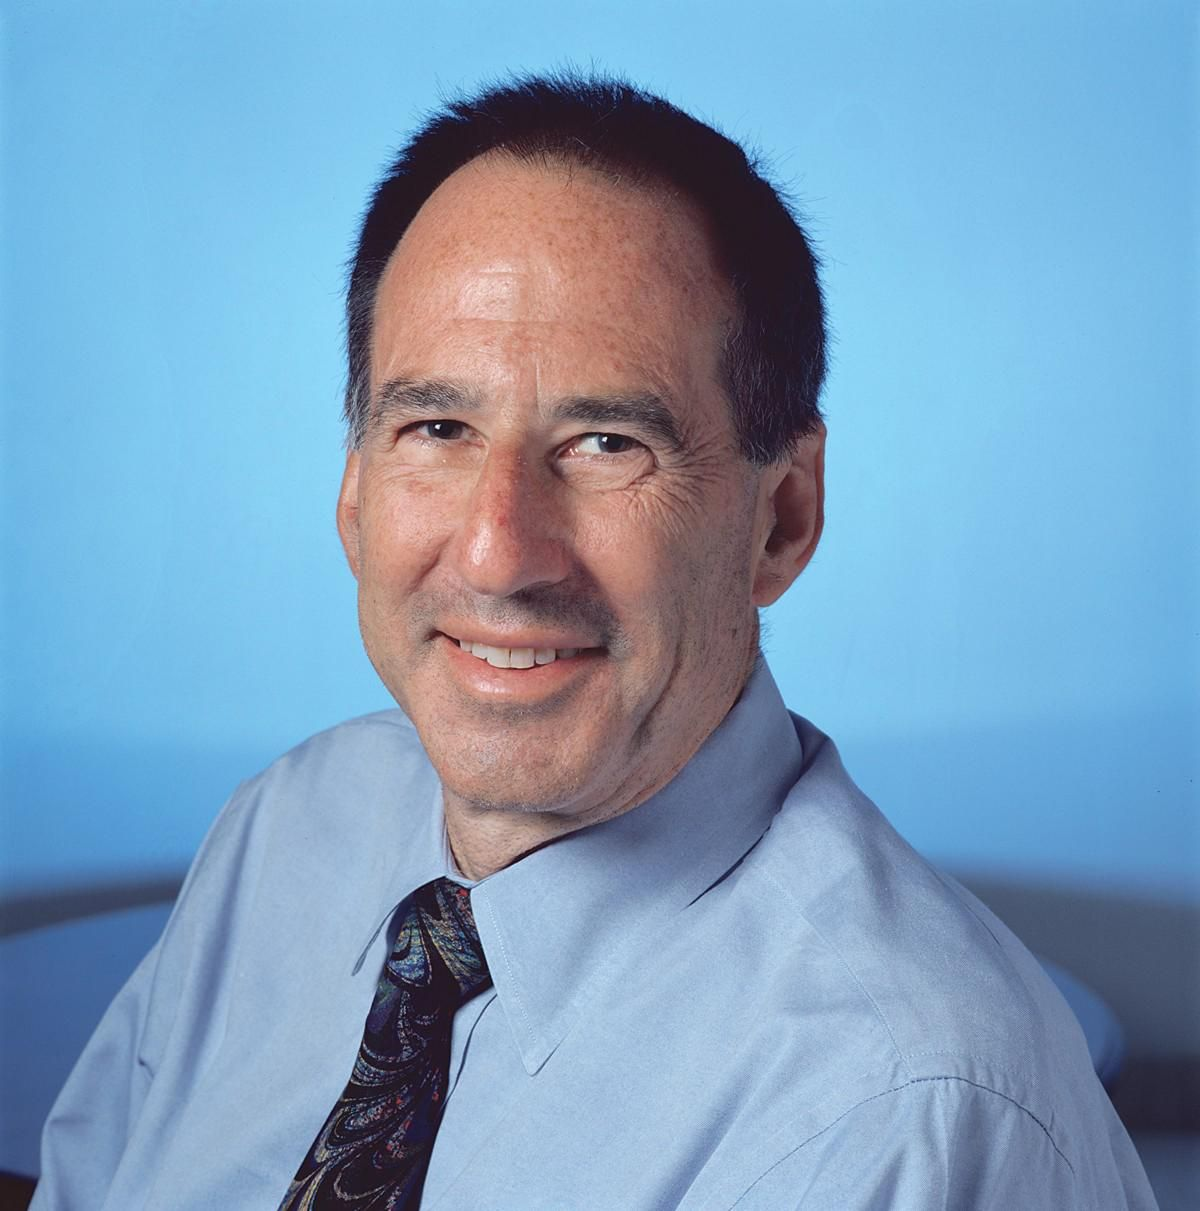 Neil Perlman